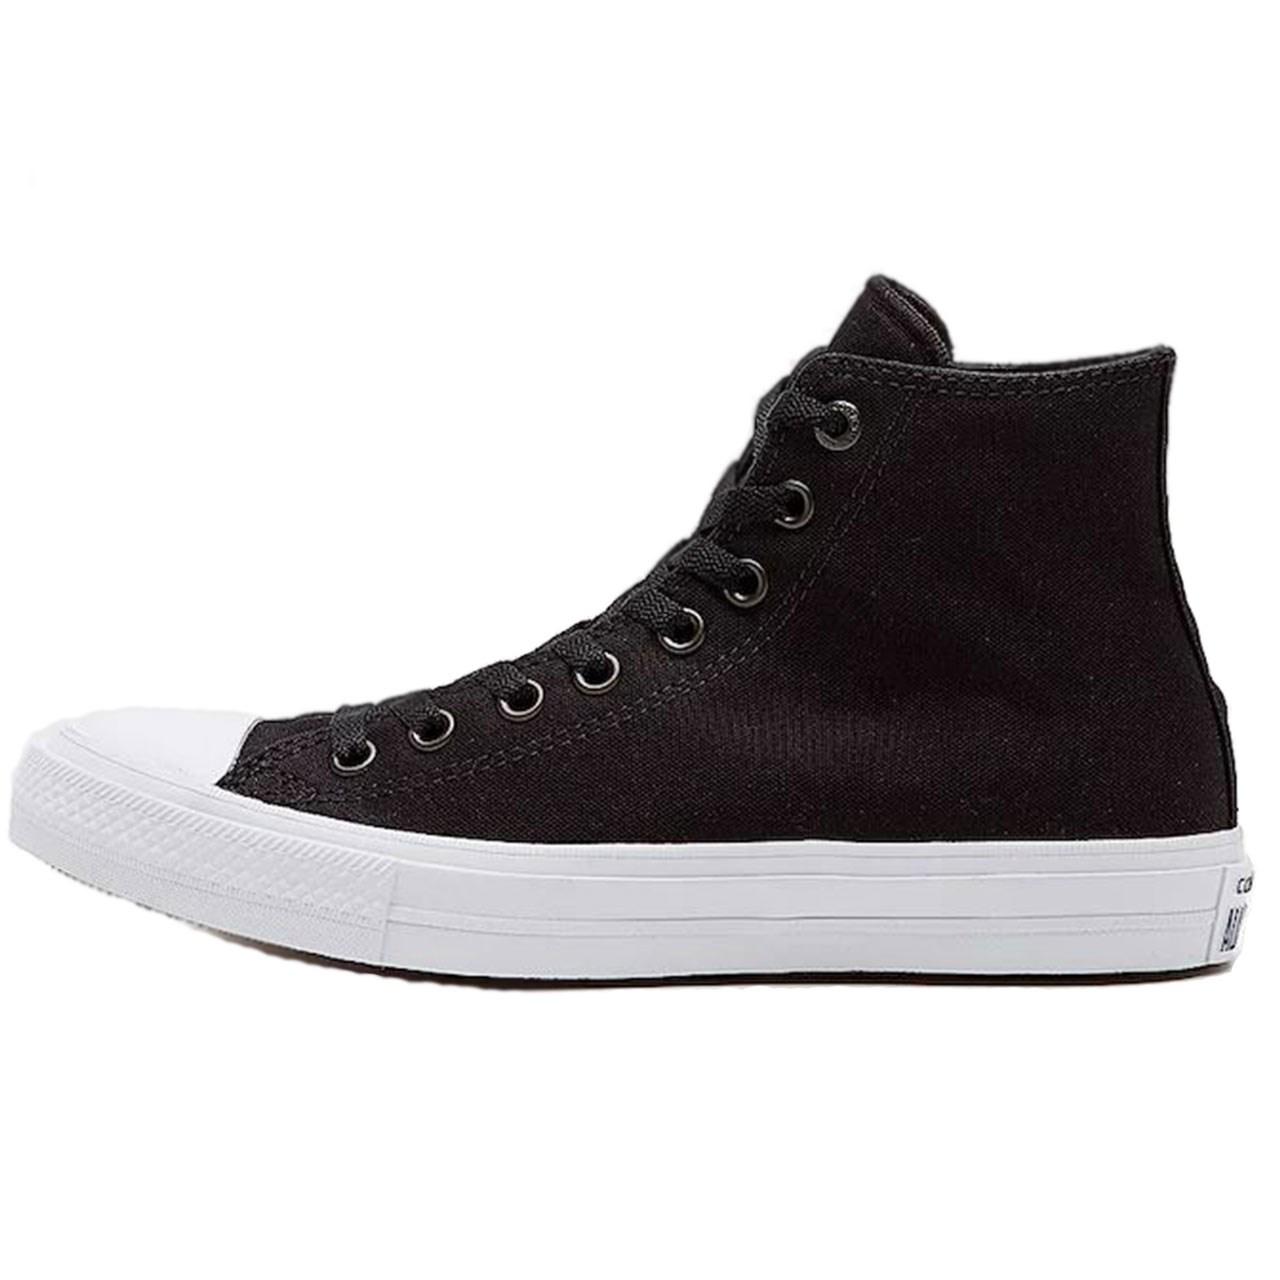 کفش کانورس مدل Chuck Taylor All Star II